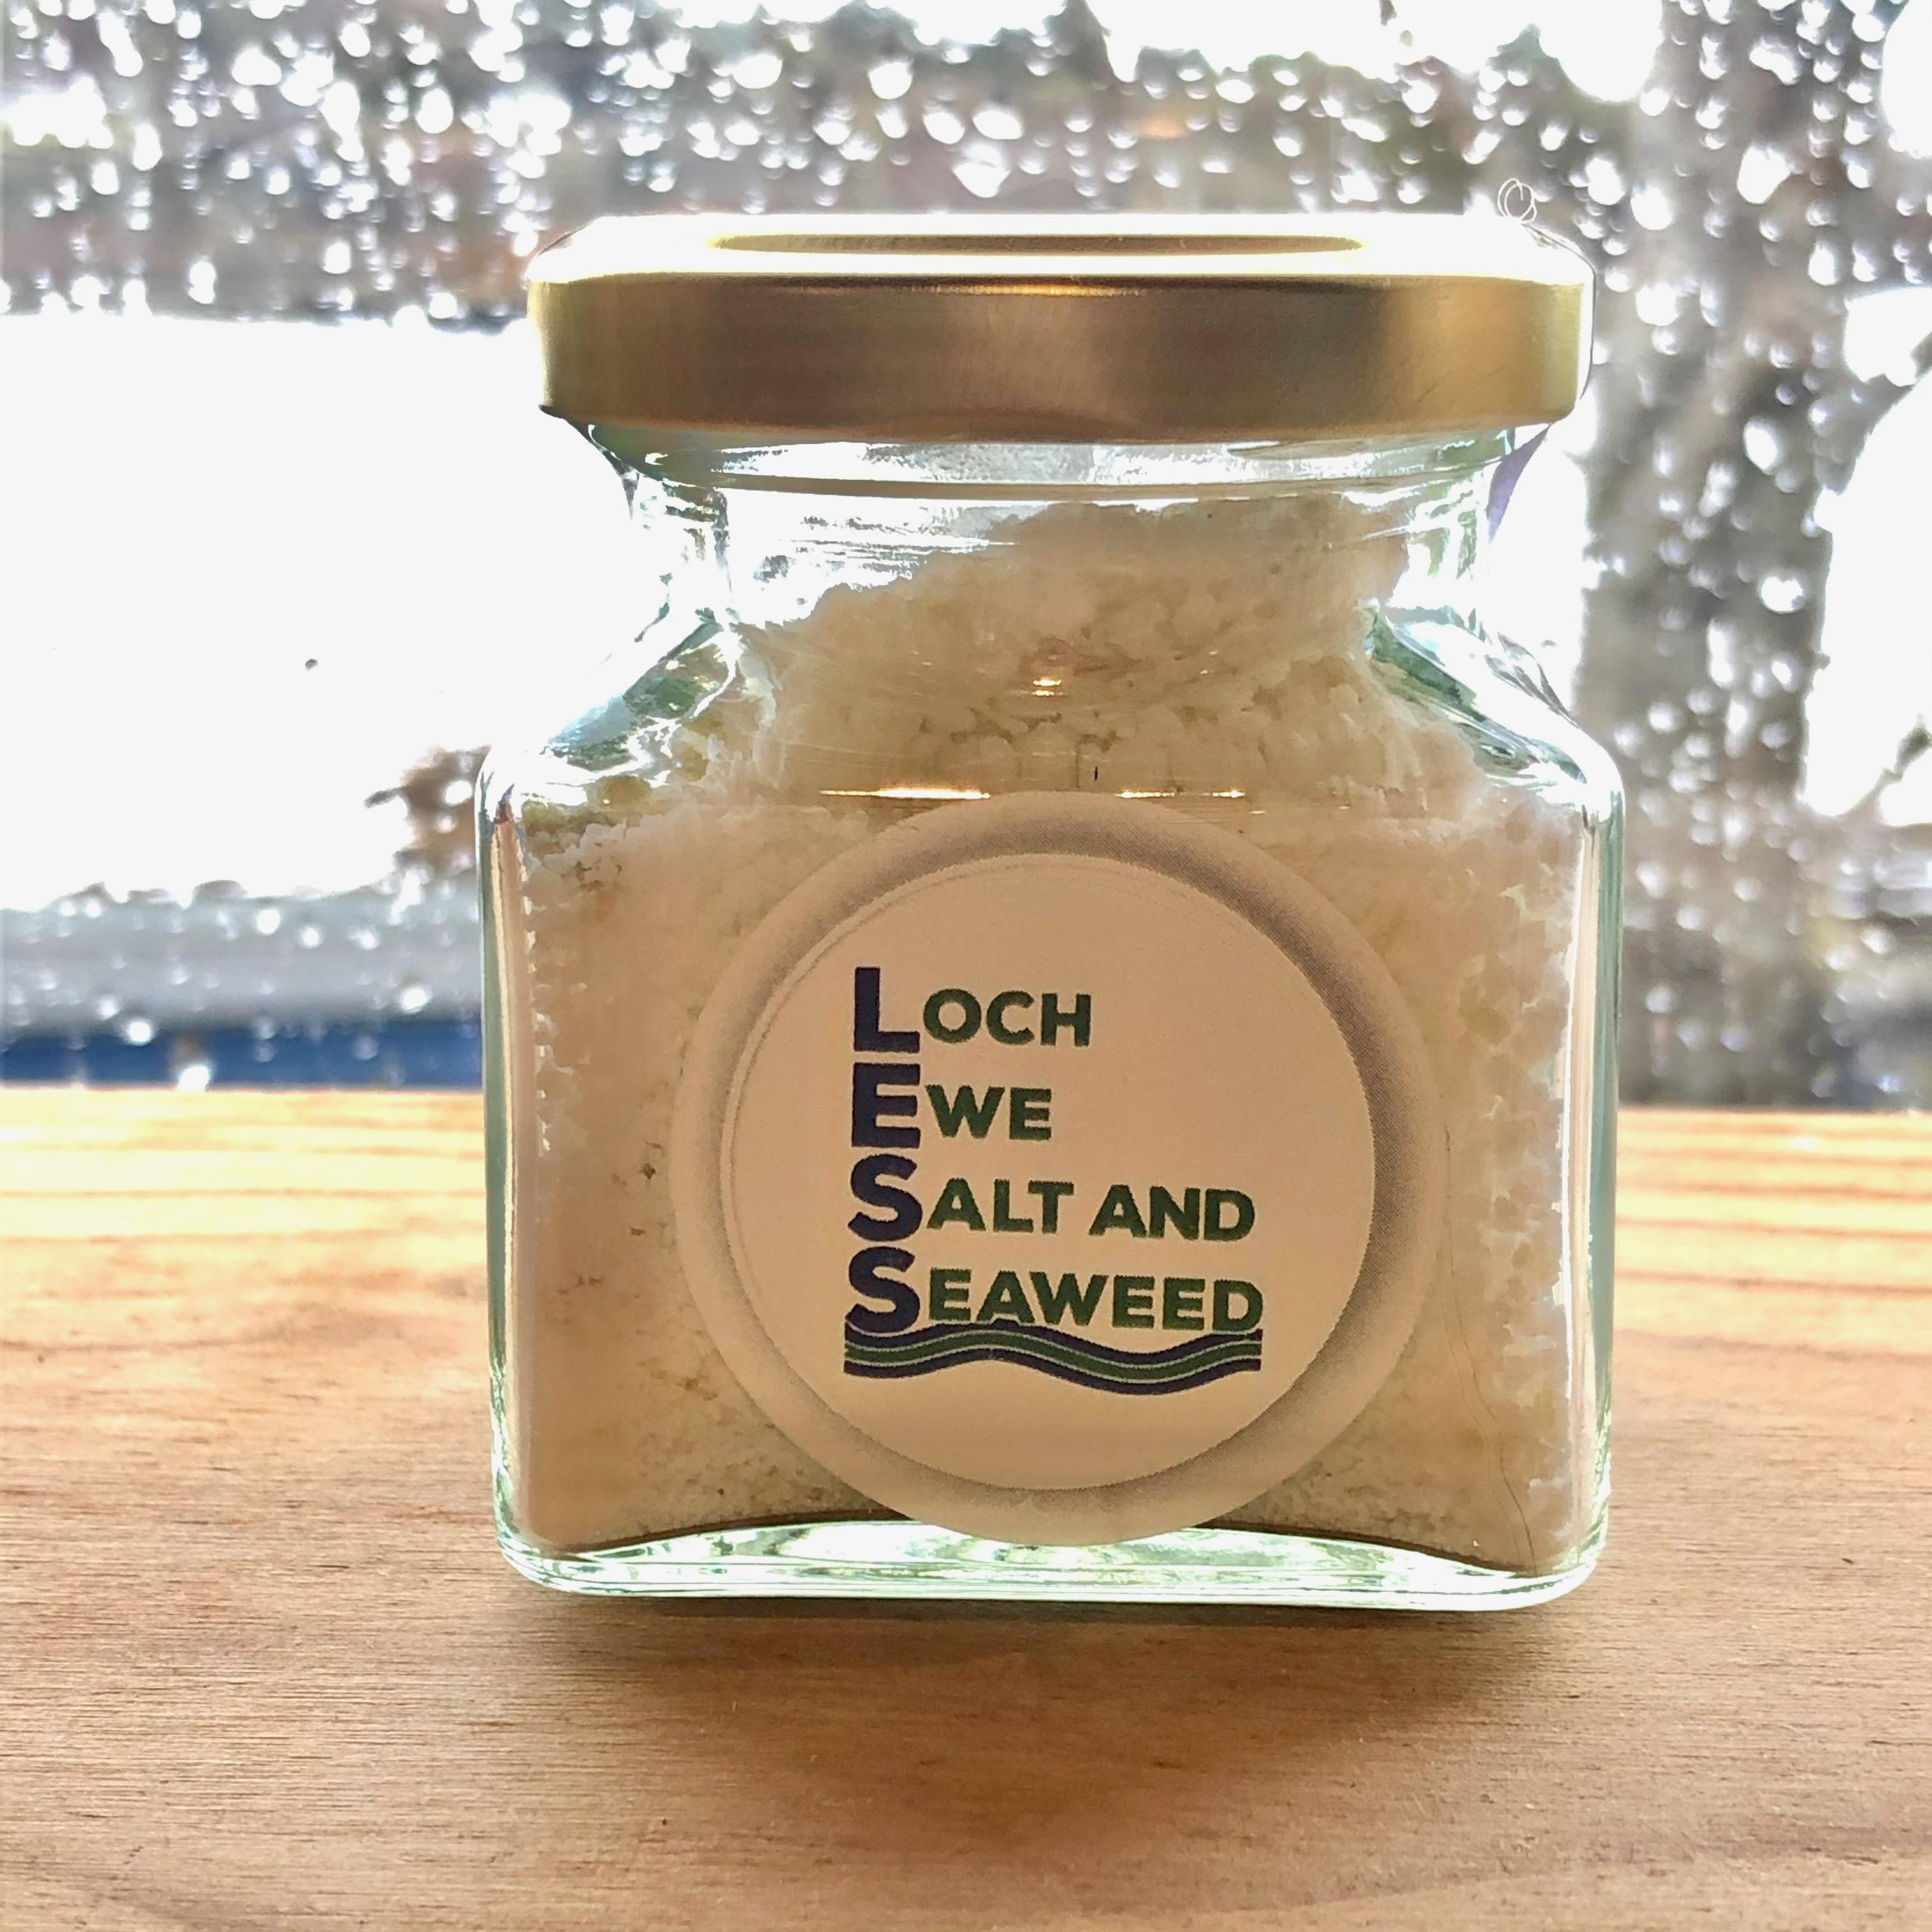 Loch Ewe Sea Salt Jar 75g: Roast Garlic  Sea Salt